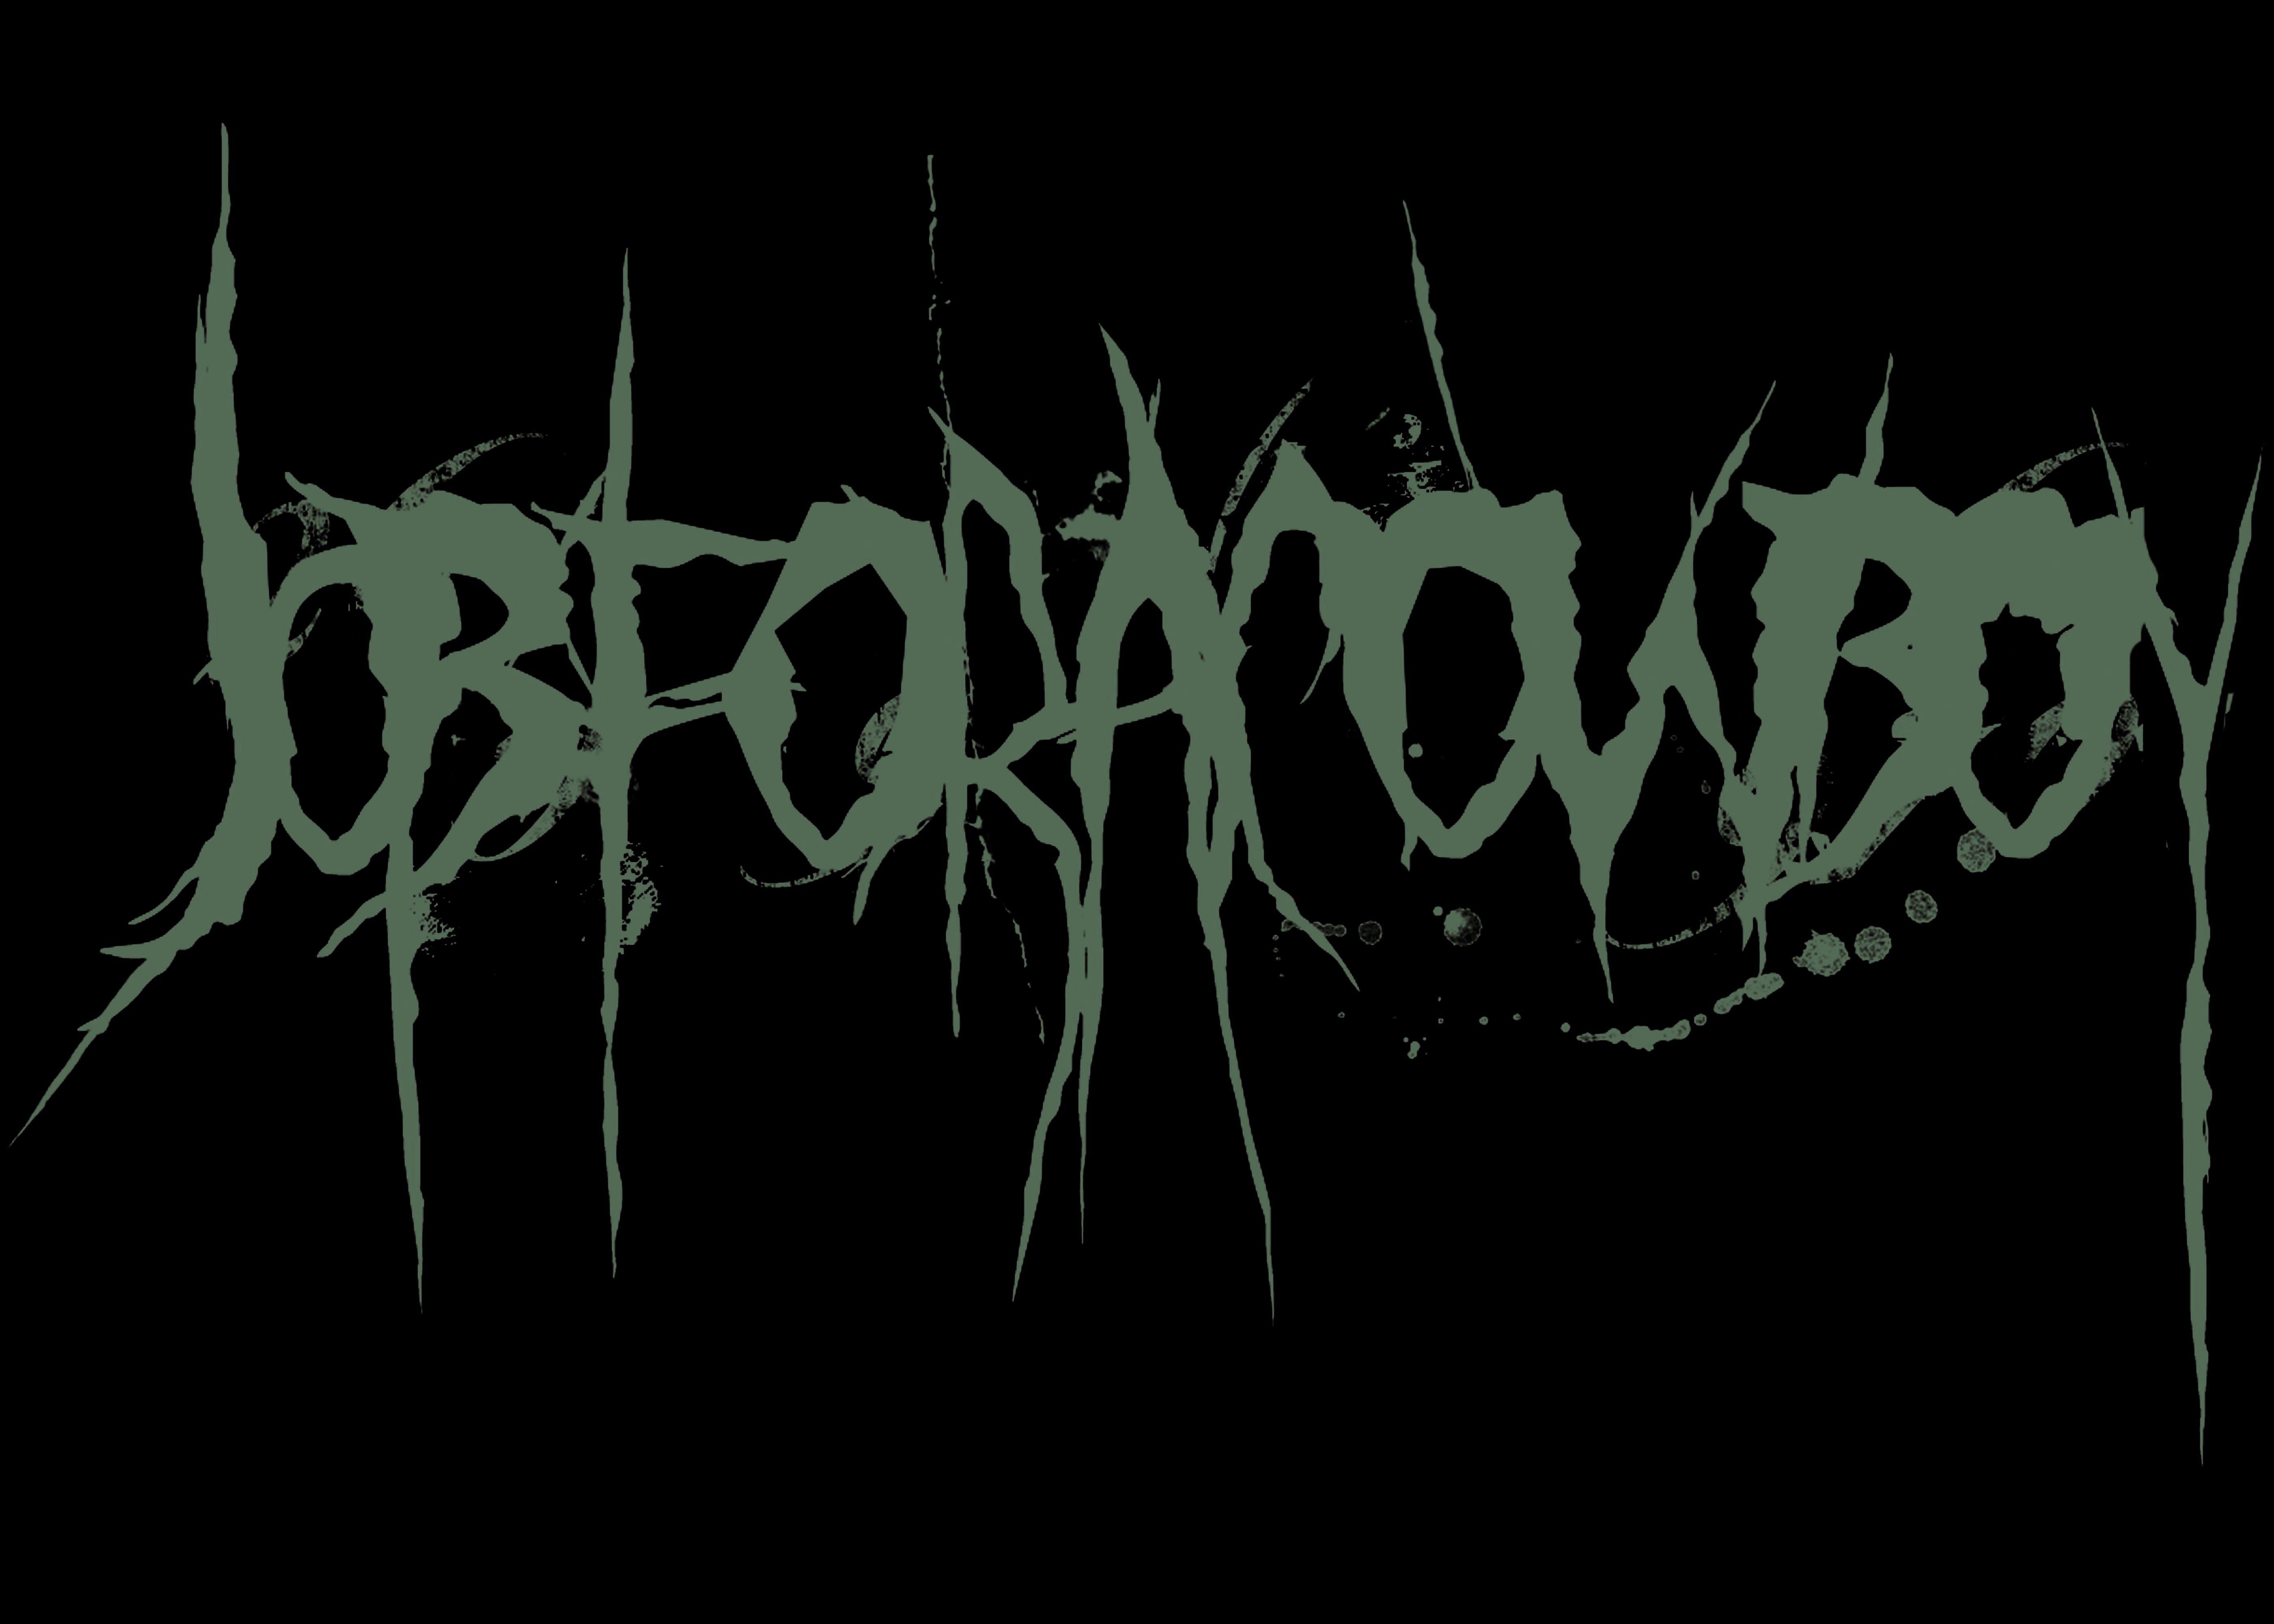 Job for a cowboy death metal heavy deathcore 1jfac dark wallpaper 5600x4000 634291 wallpaperup